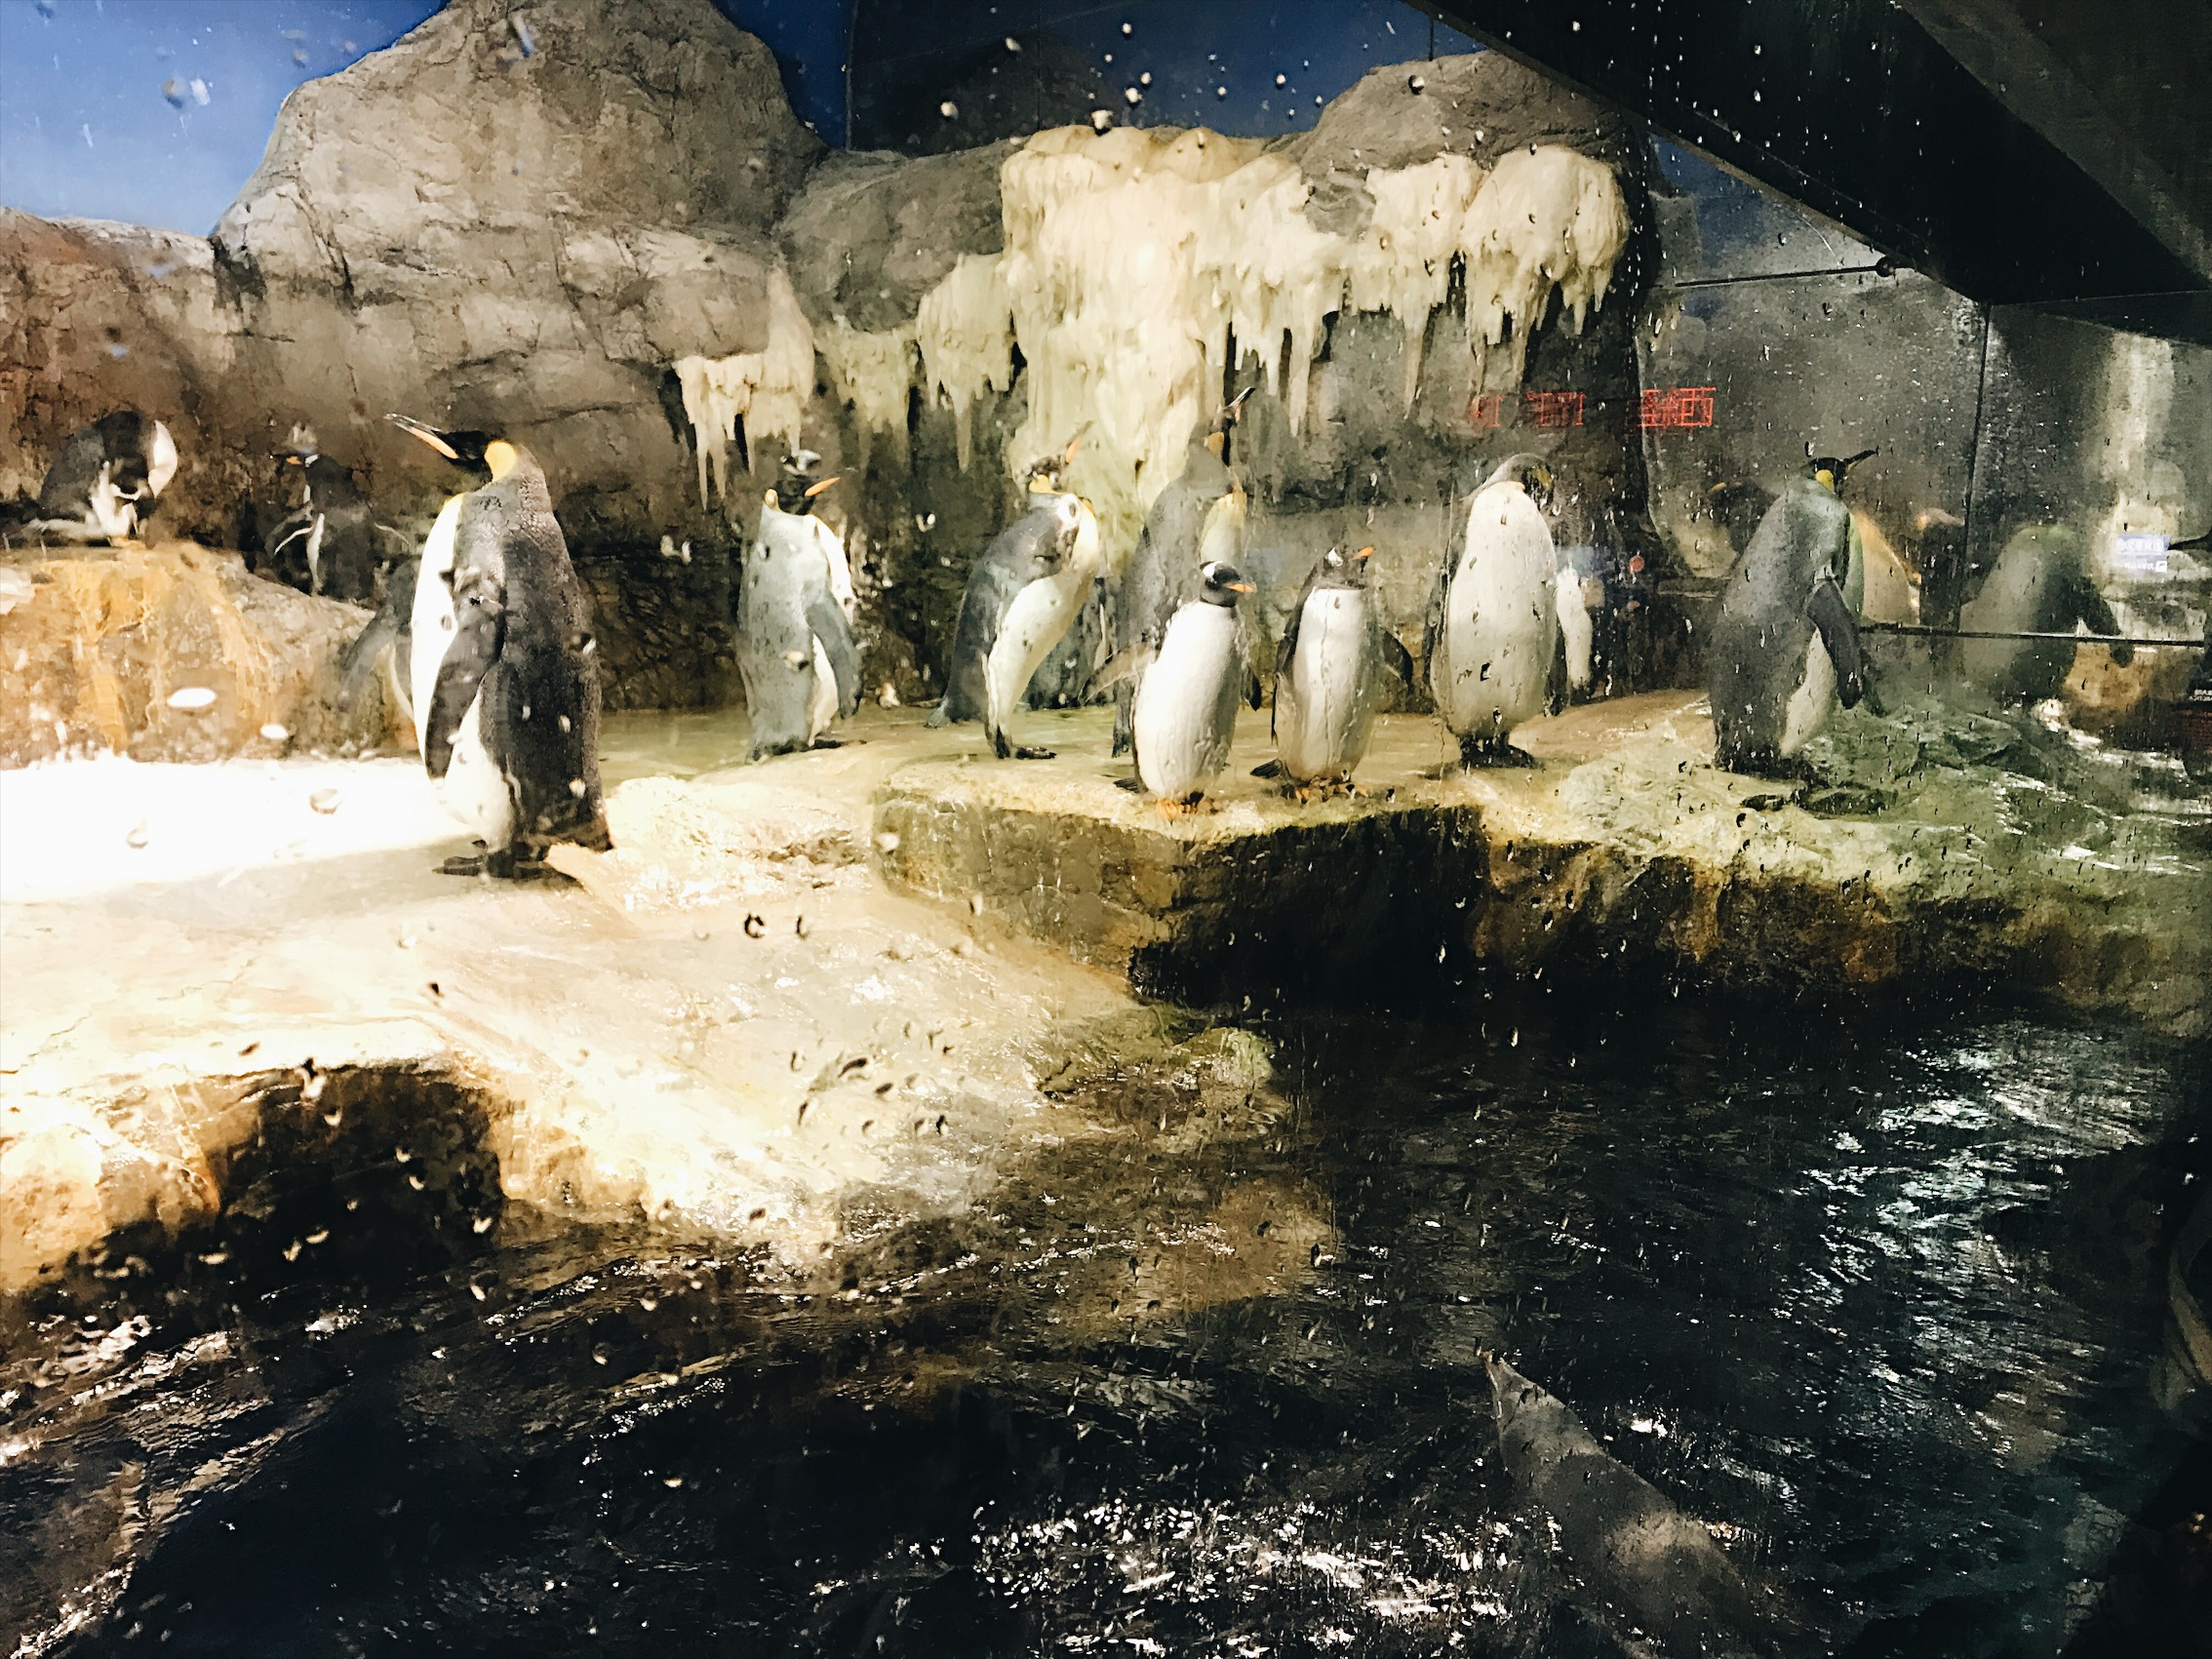 Did you guys know I love penguins? I do.